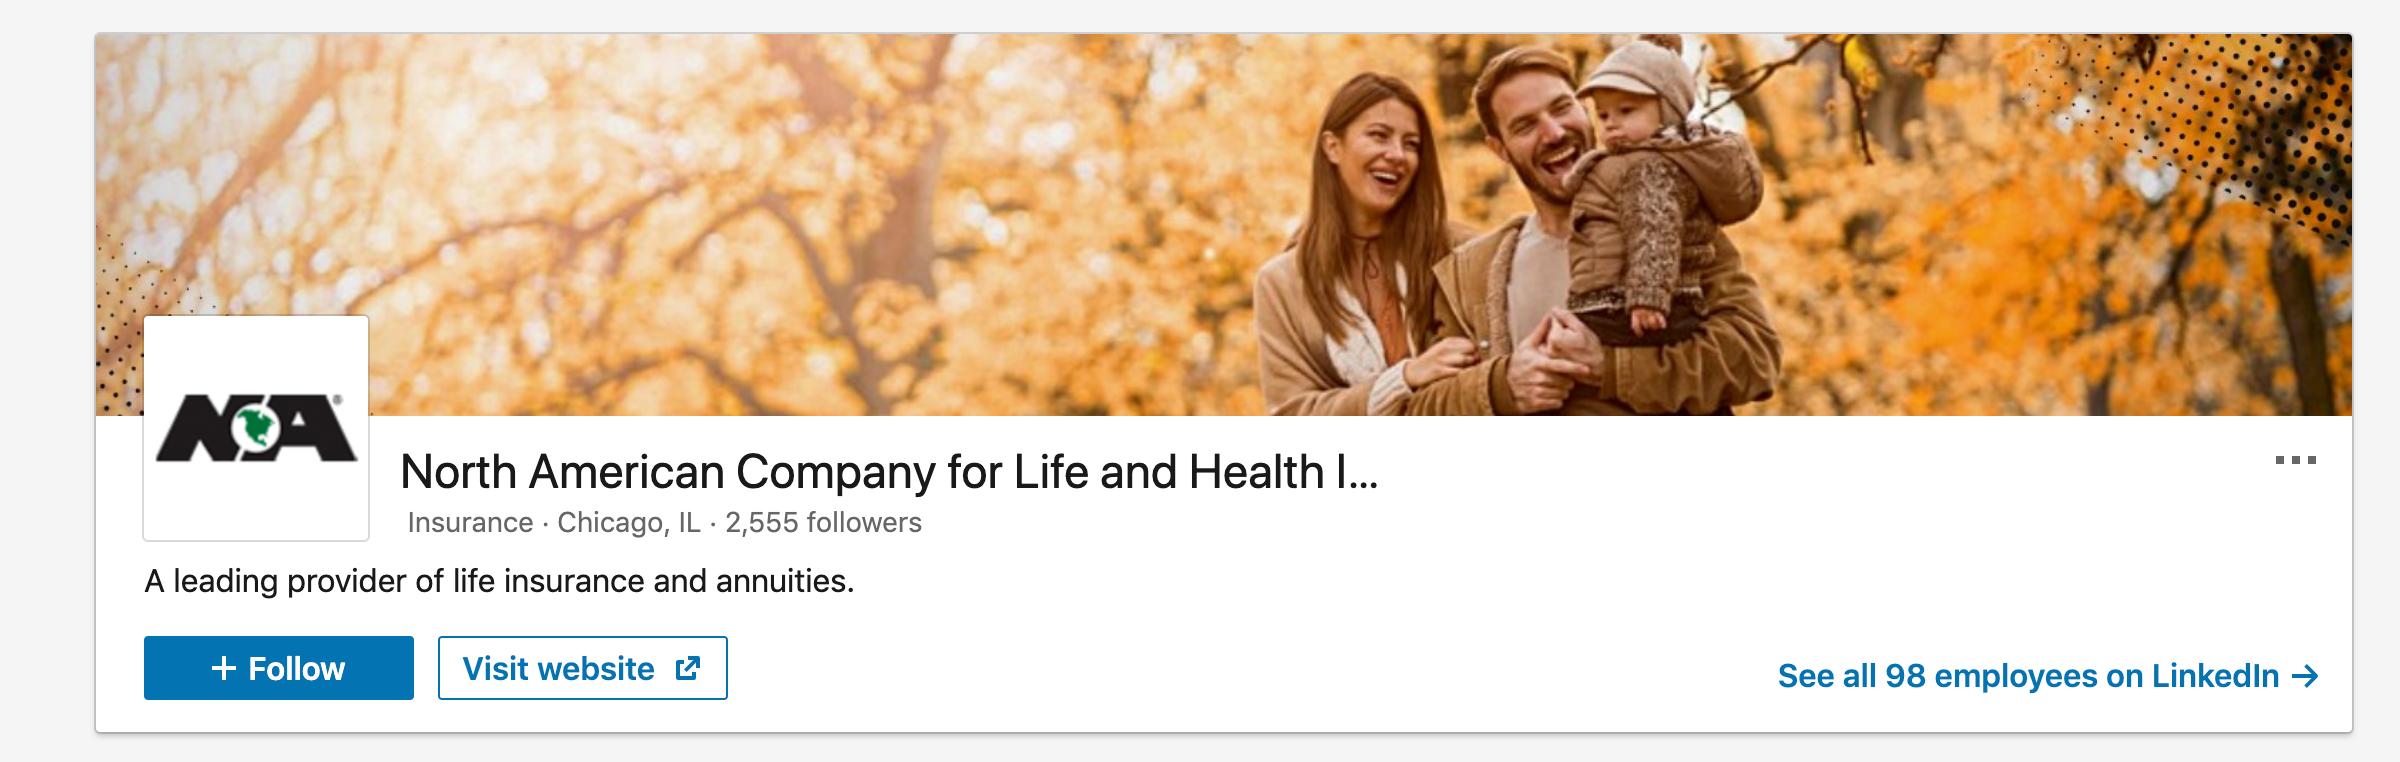 North American Company LinkedIn